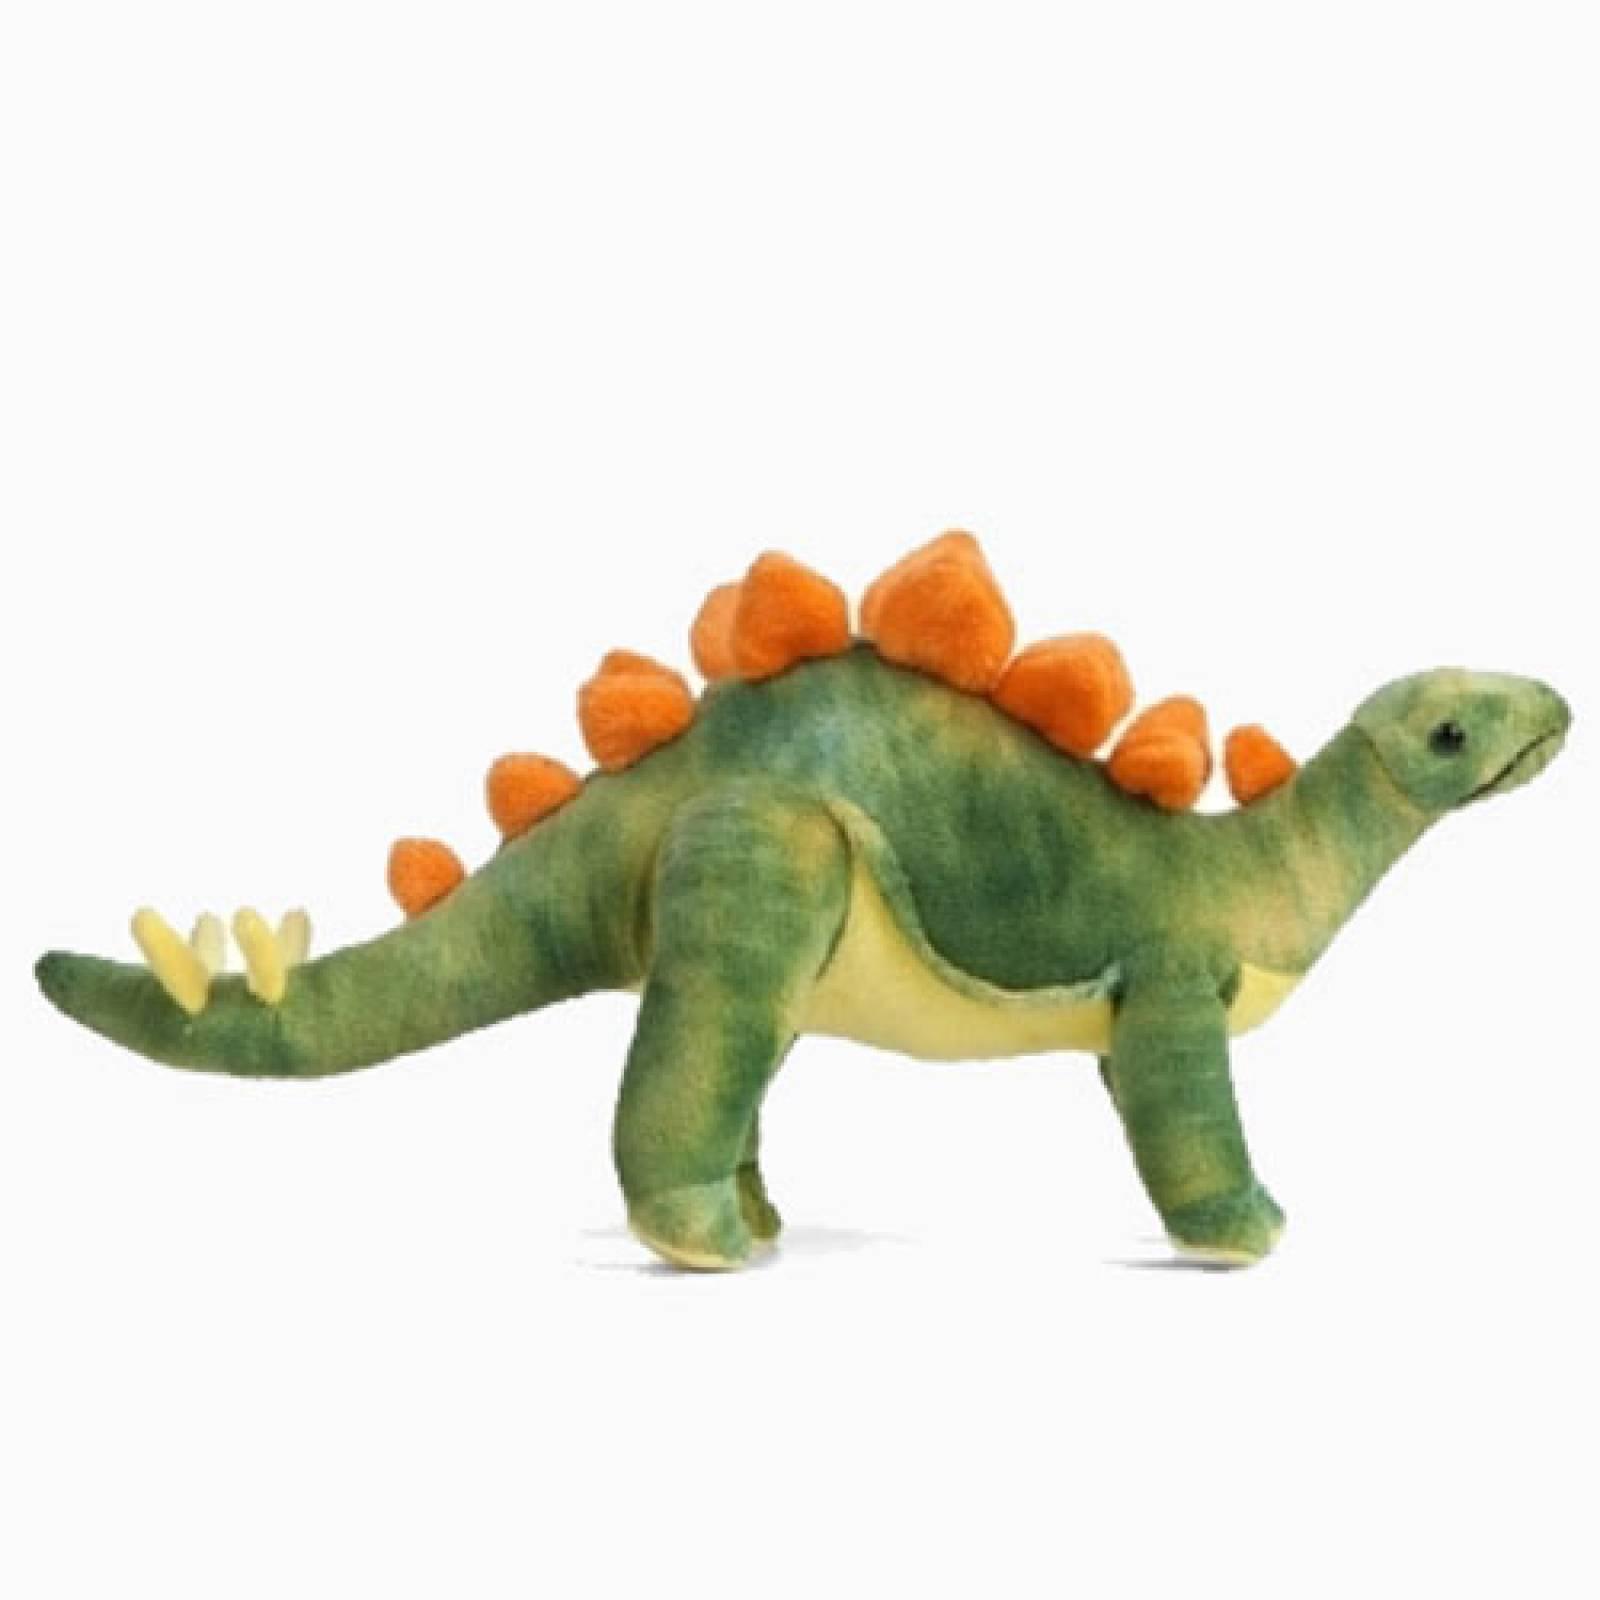 Stegosaurus Dinosaur Soft Toy 0+